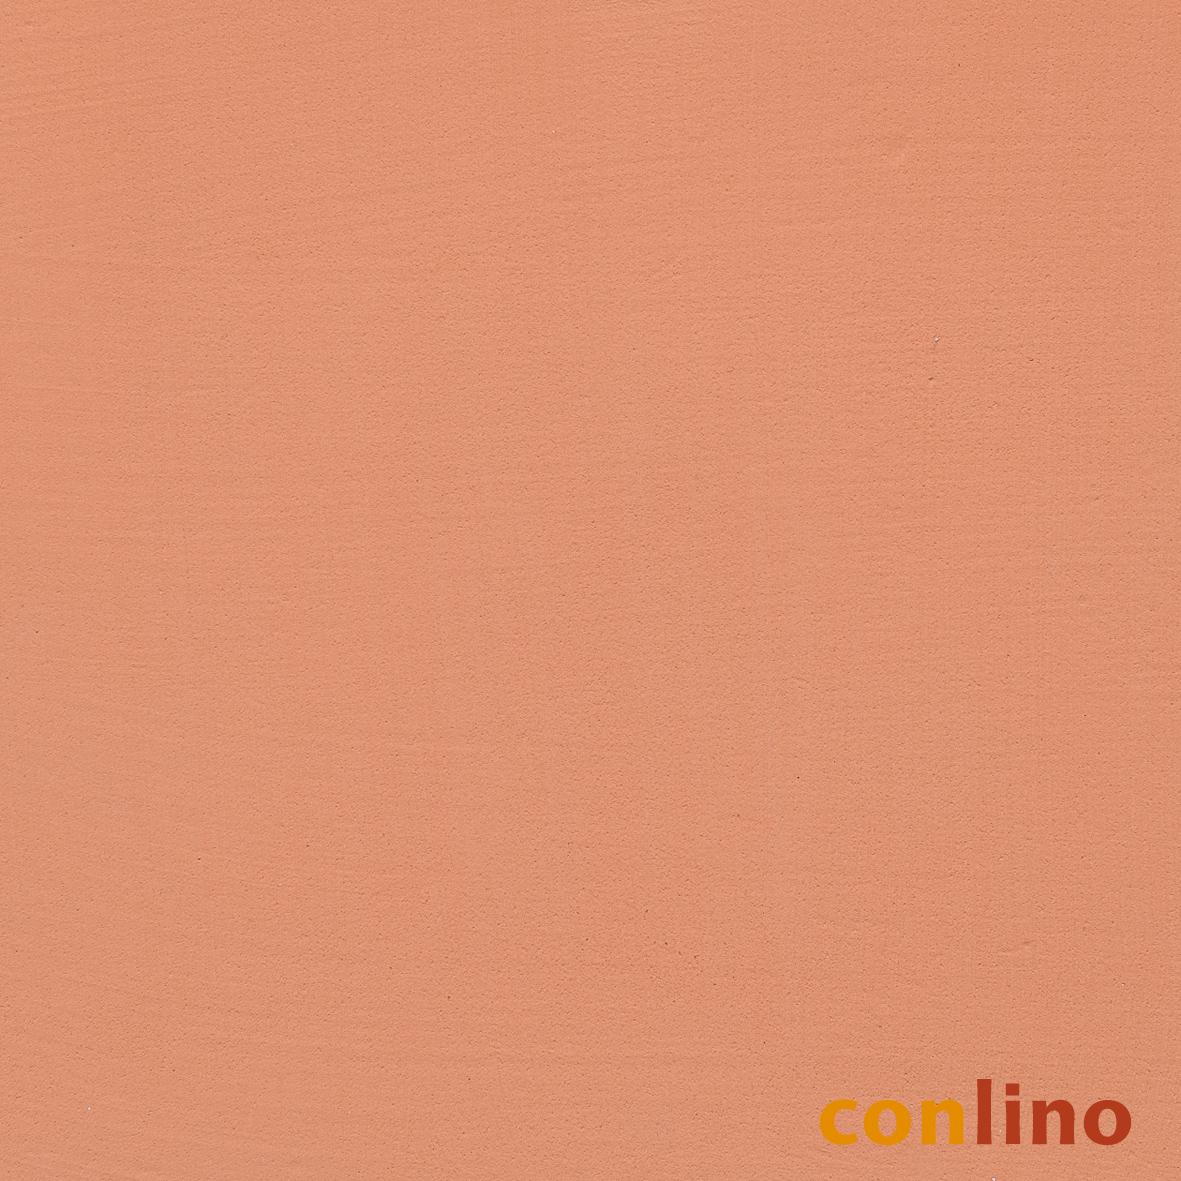 conlino Lehmfarbe Siena CL 122